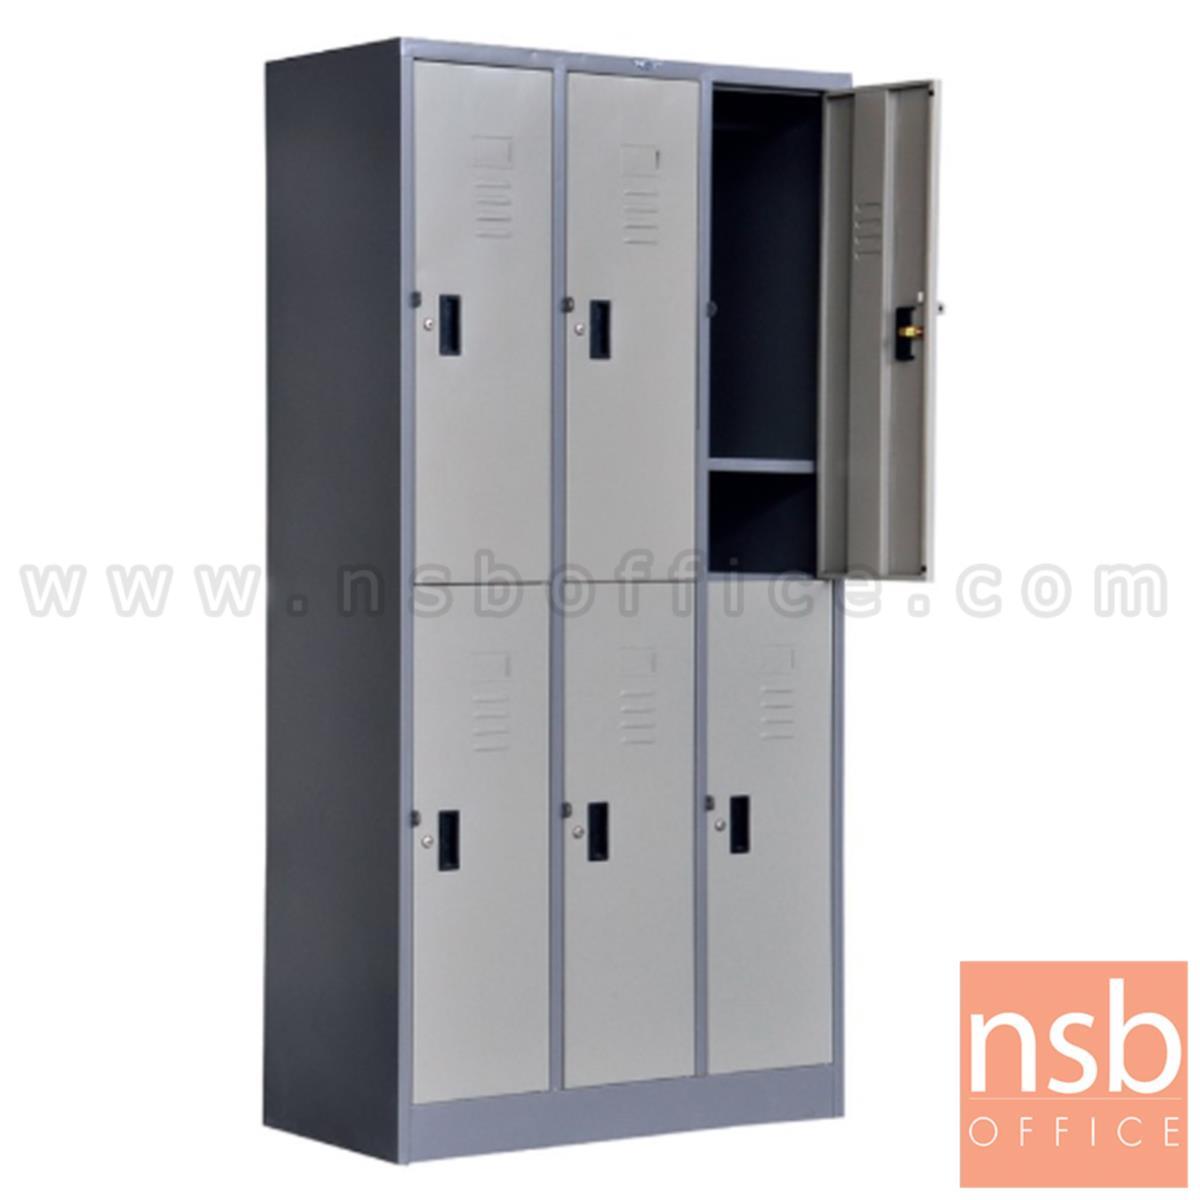 E08A006:ตู้ล็อกเกอร์ 6 ประตู รุ่น Weisz (ไวสซ์)  ขนาด 91W*45D*182H cm.